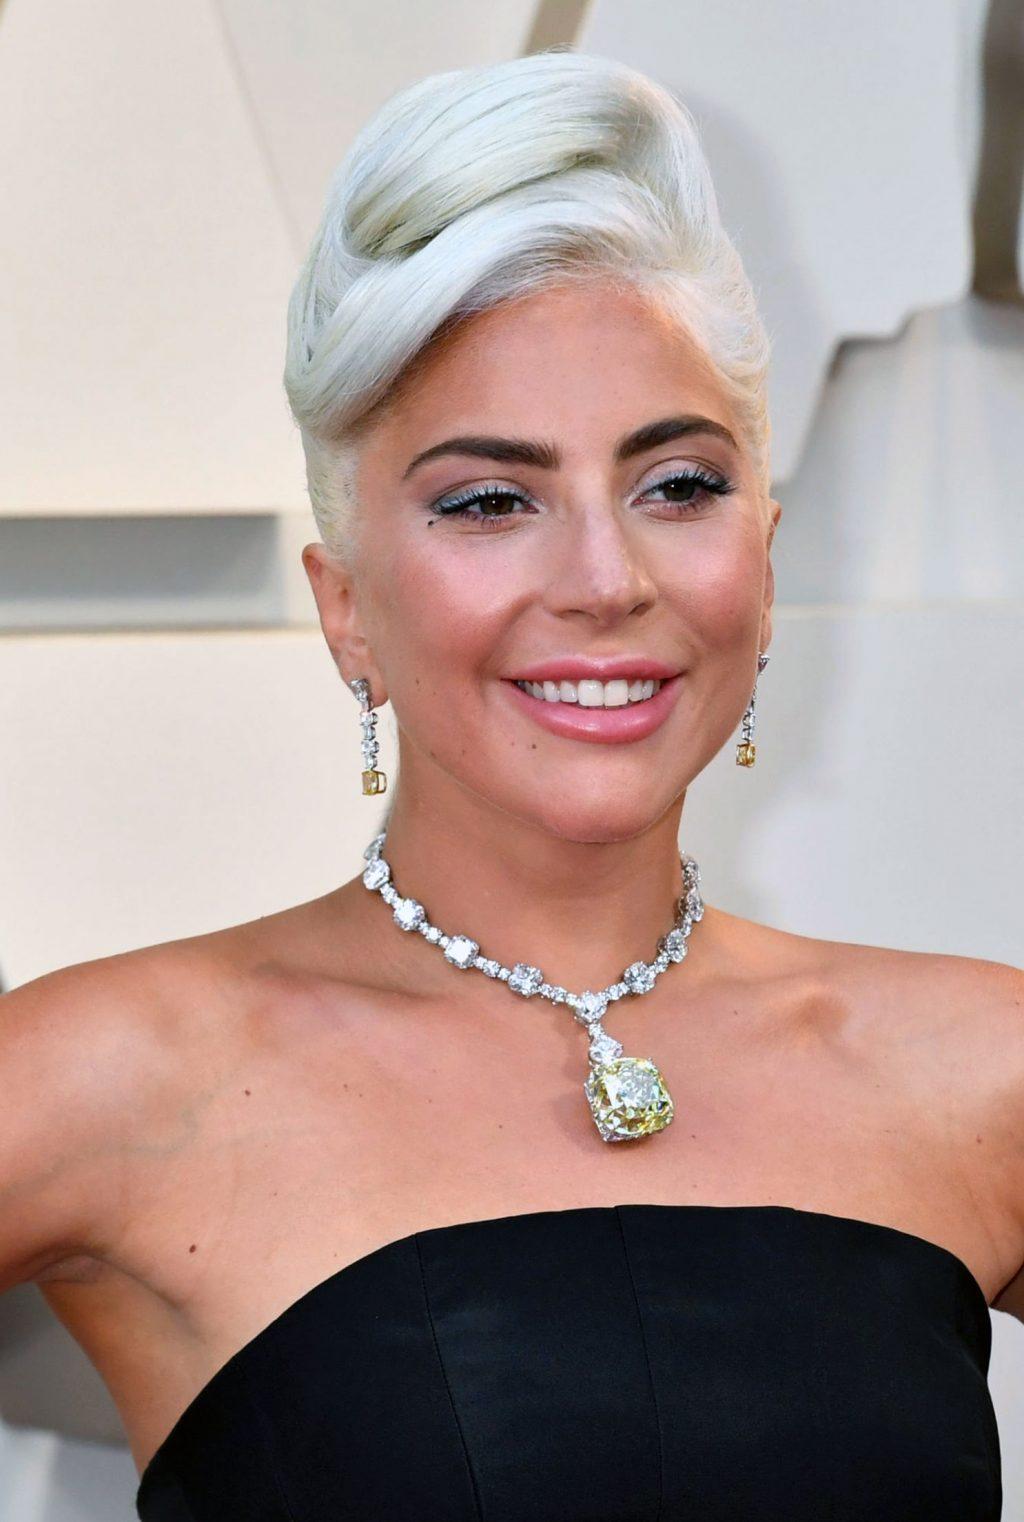 Lady Gaga cleavage